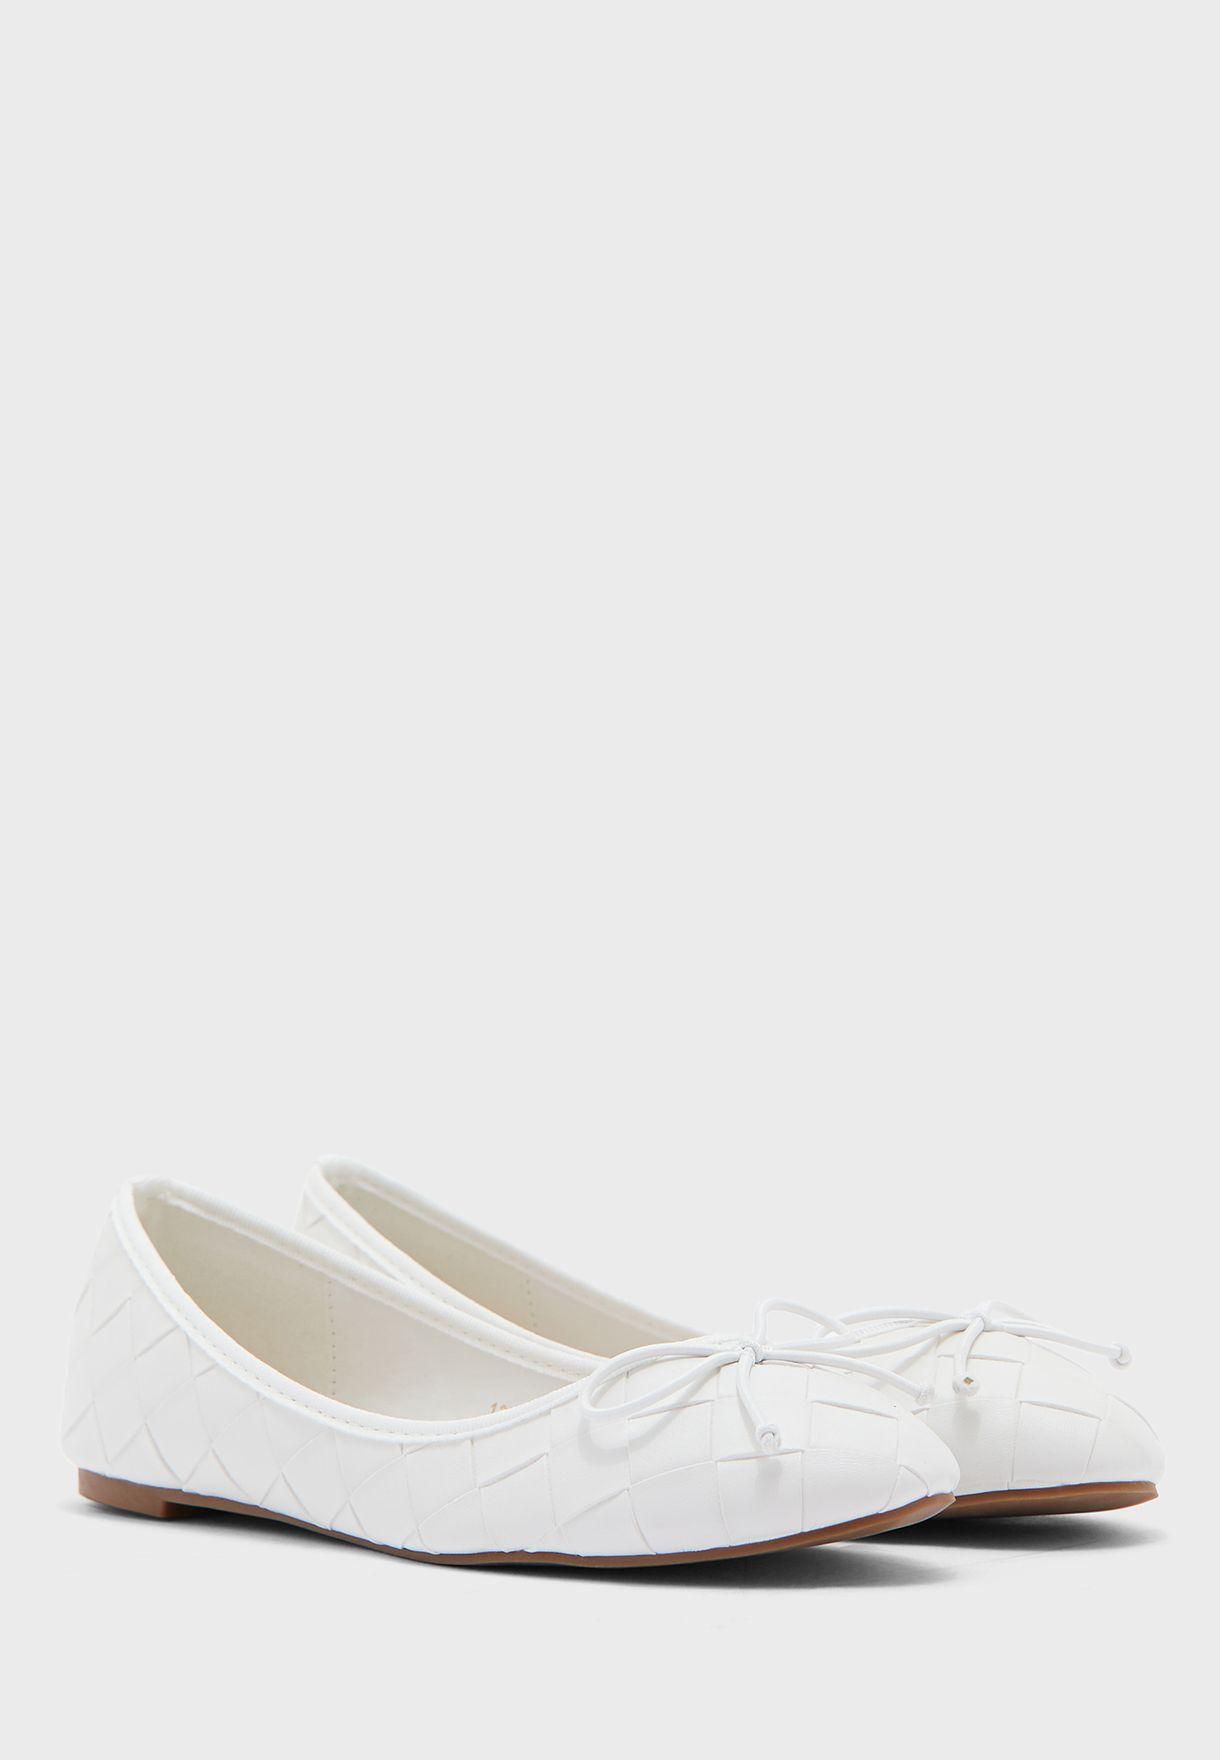 Weaved Ballerina Flat Shoe